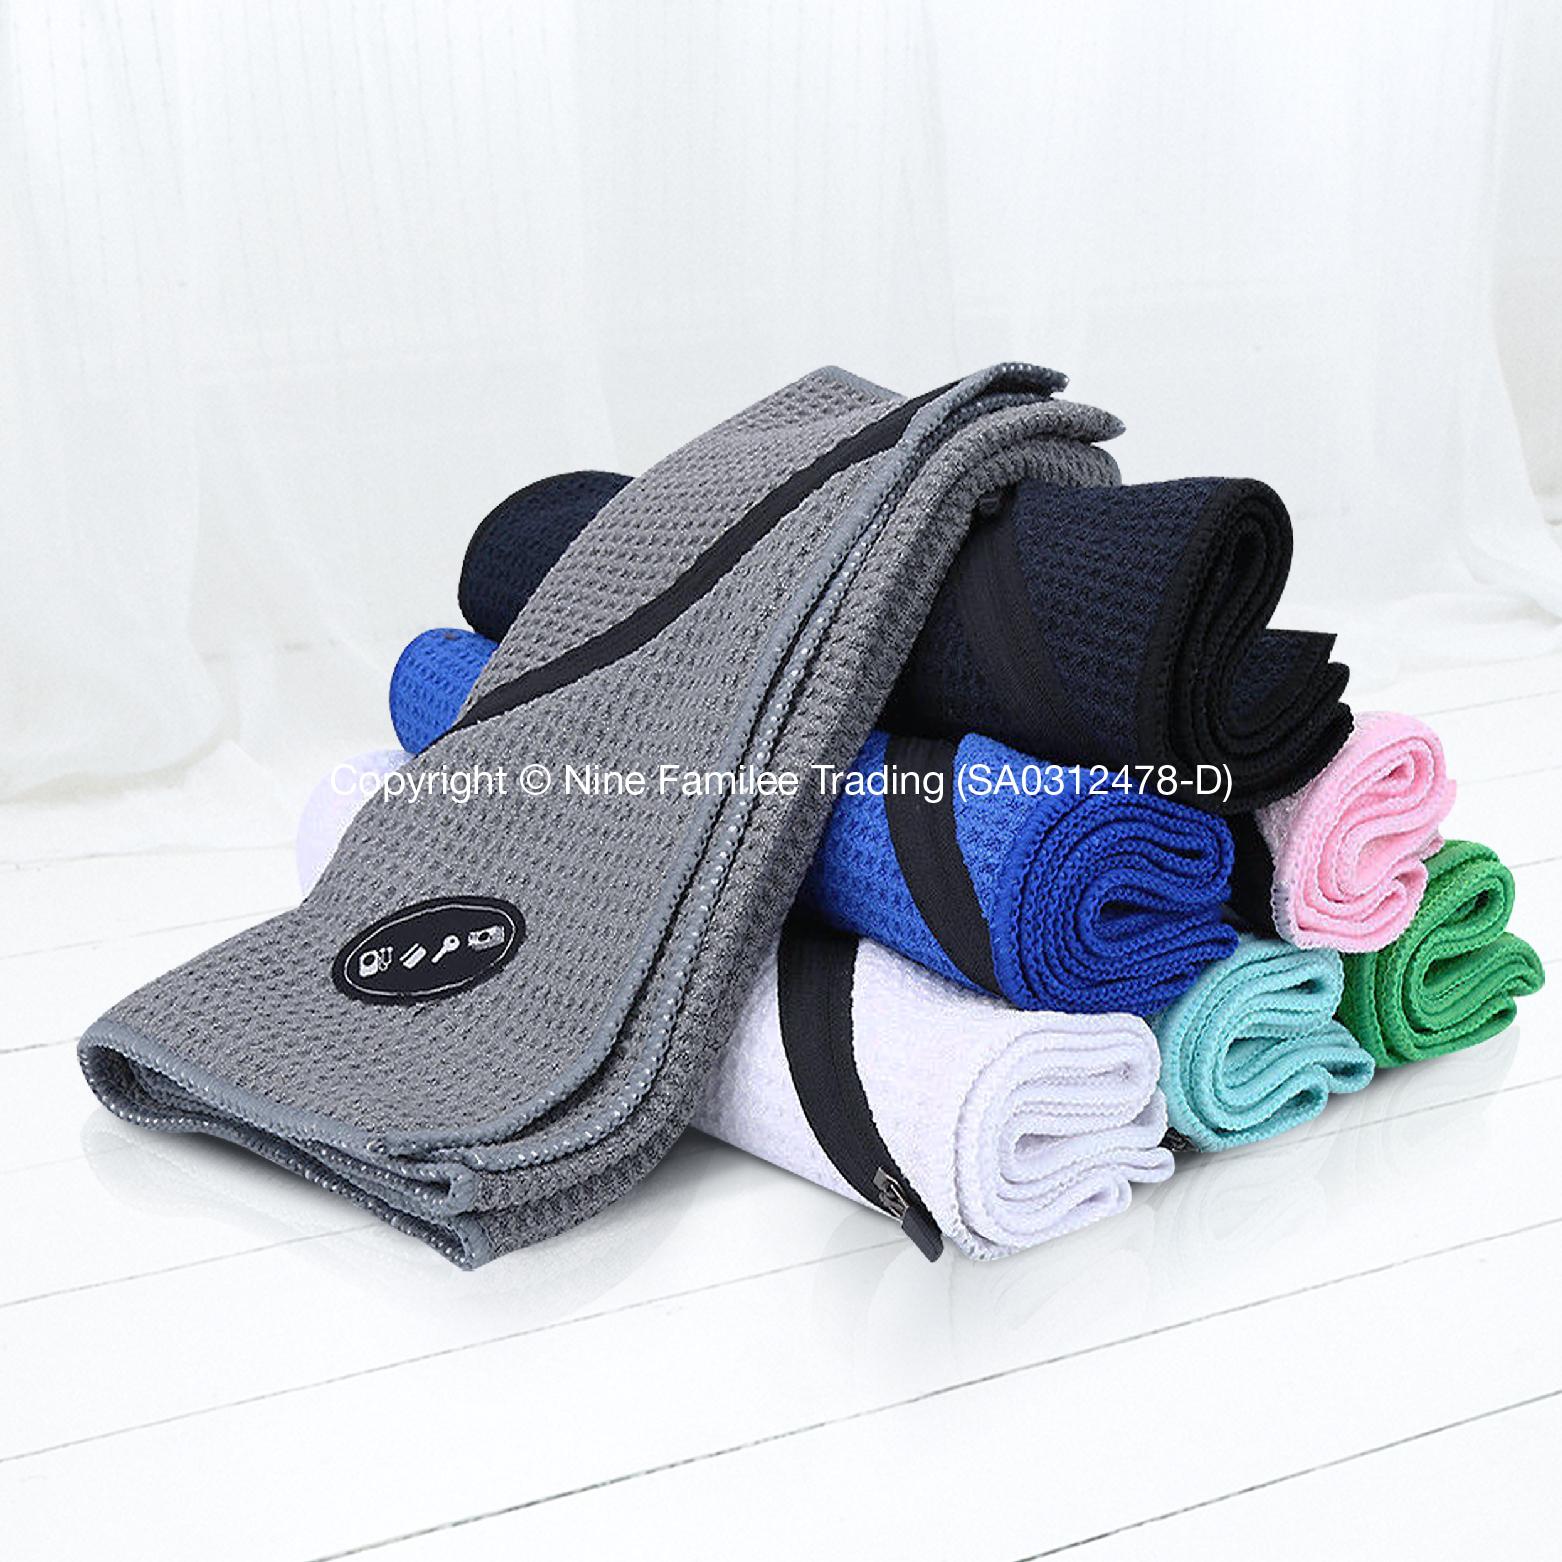 Products - Zip Pocket Sports Towel-01.jpg